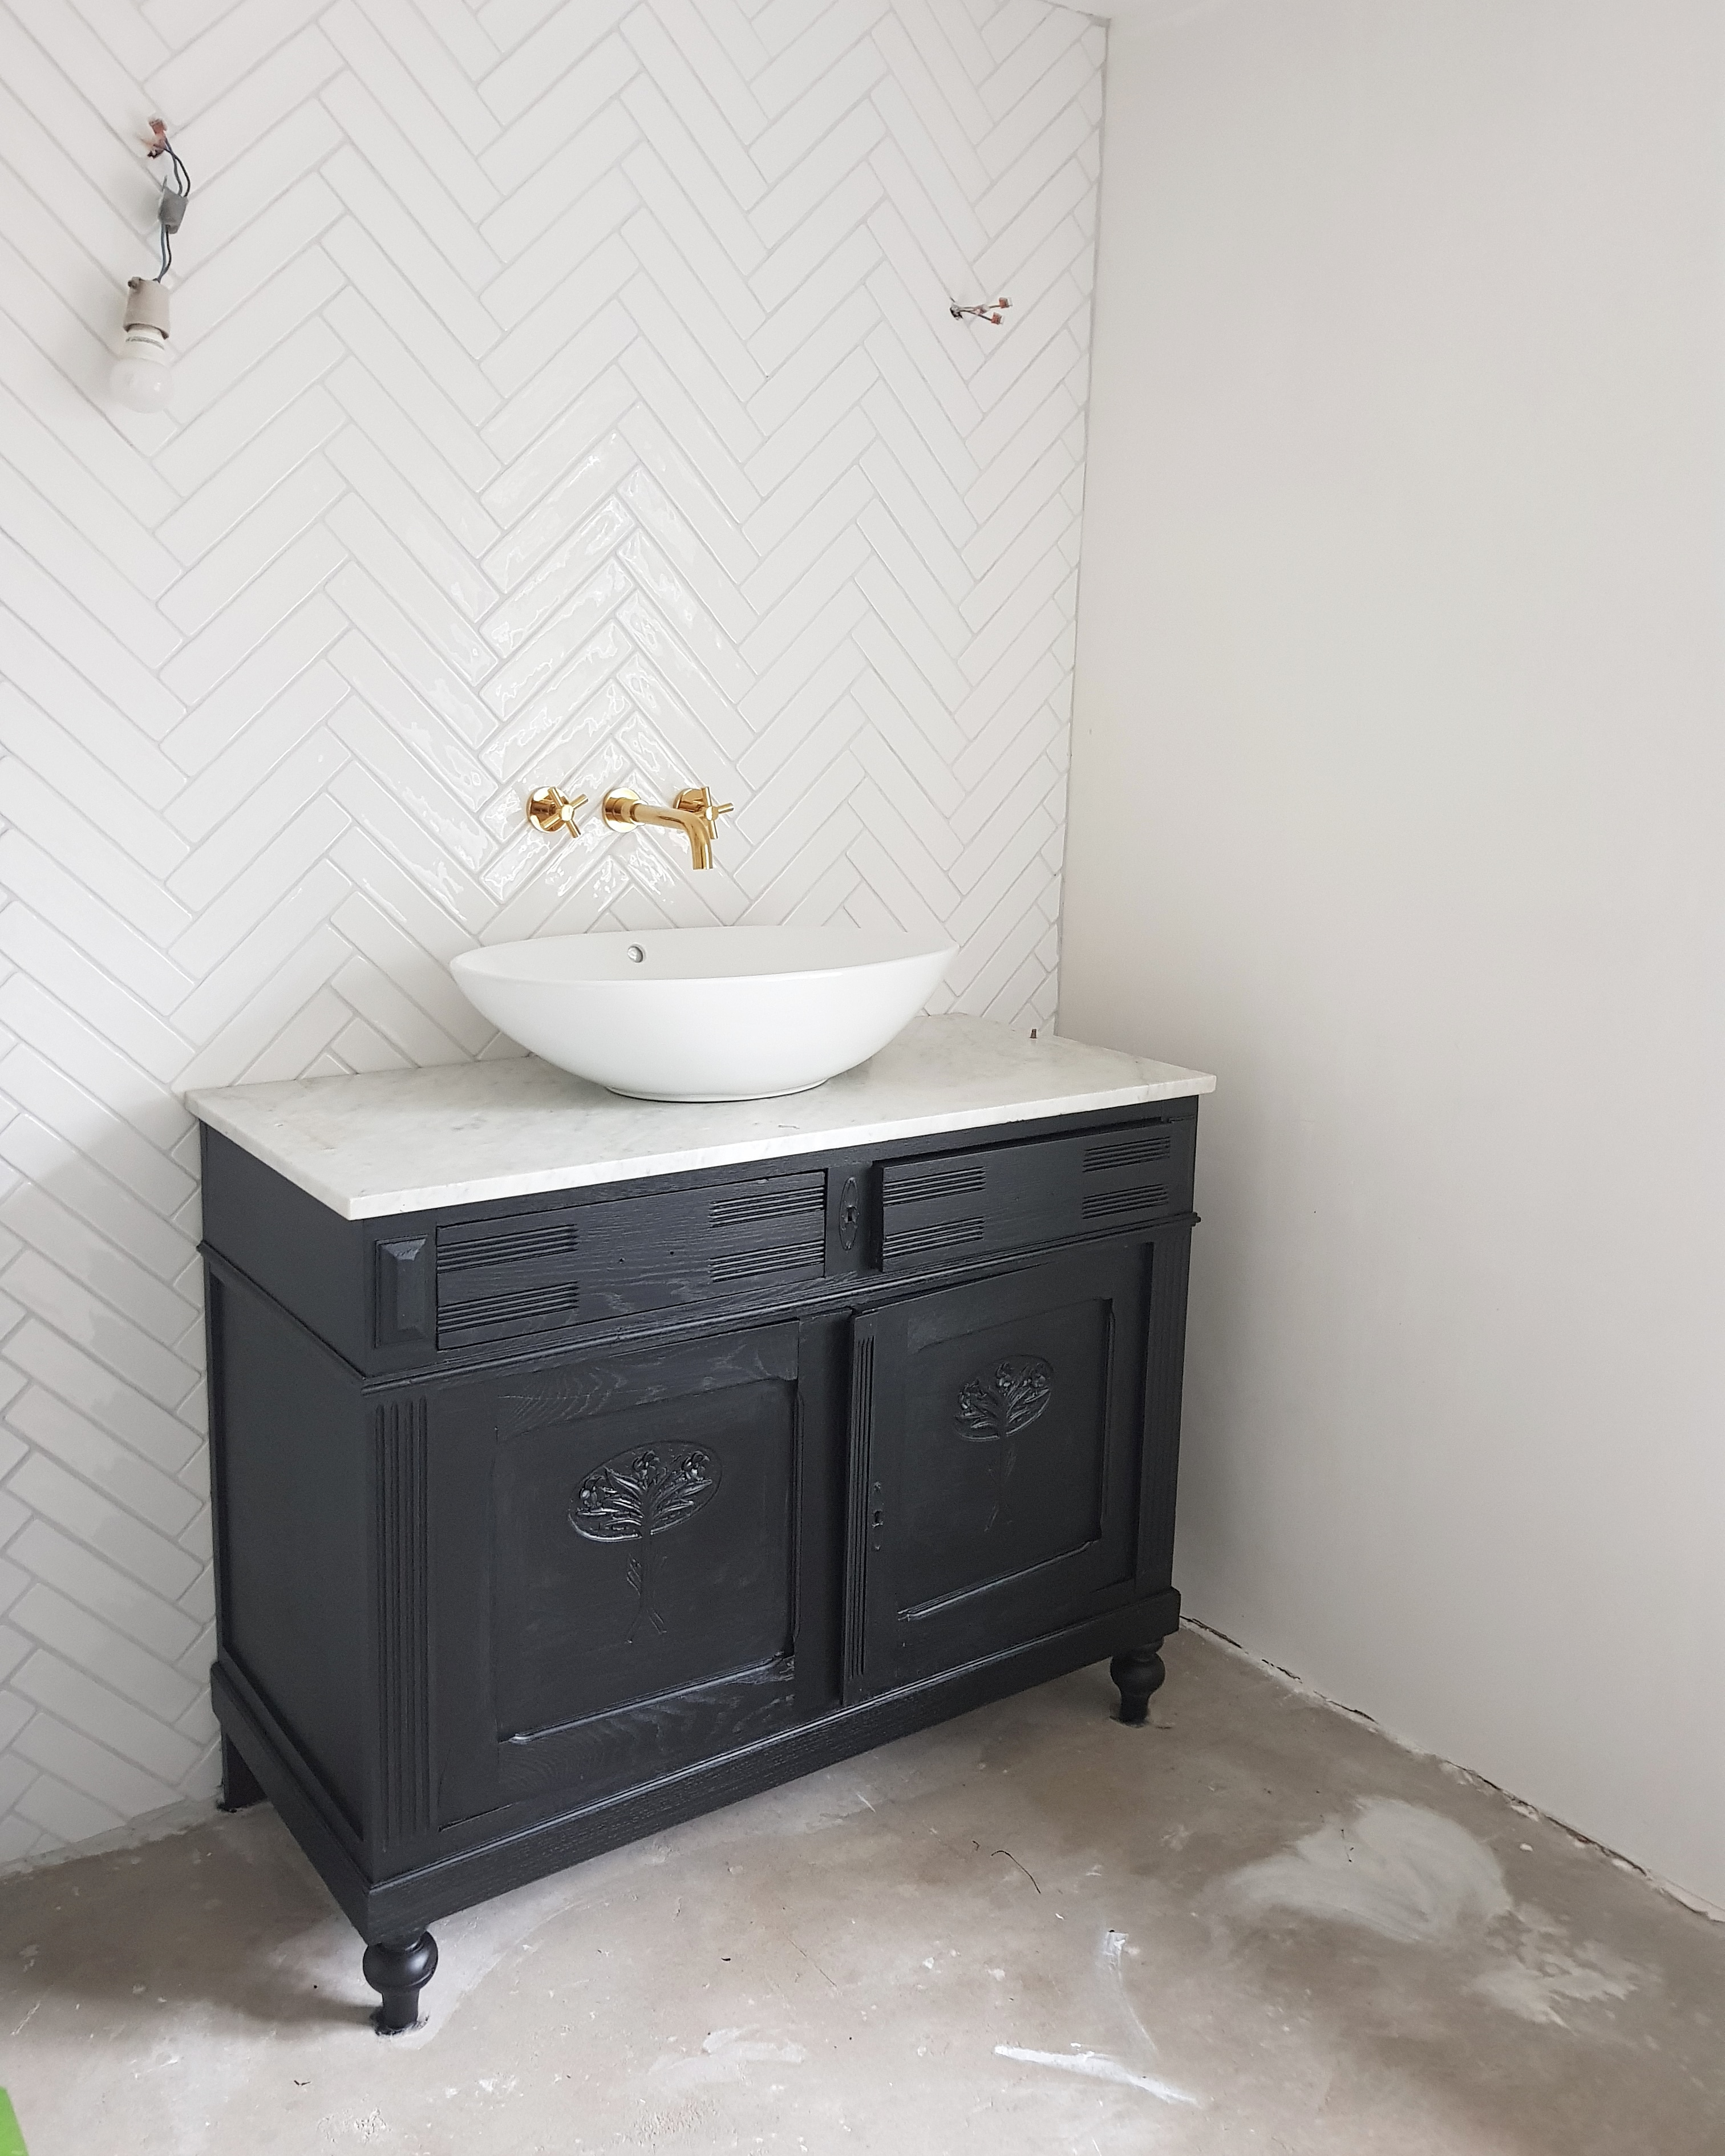 Spiegeltje spiegeltje aan de (badkamer)wand - Inspiraties - ShowHome.nl